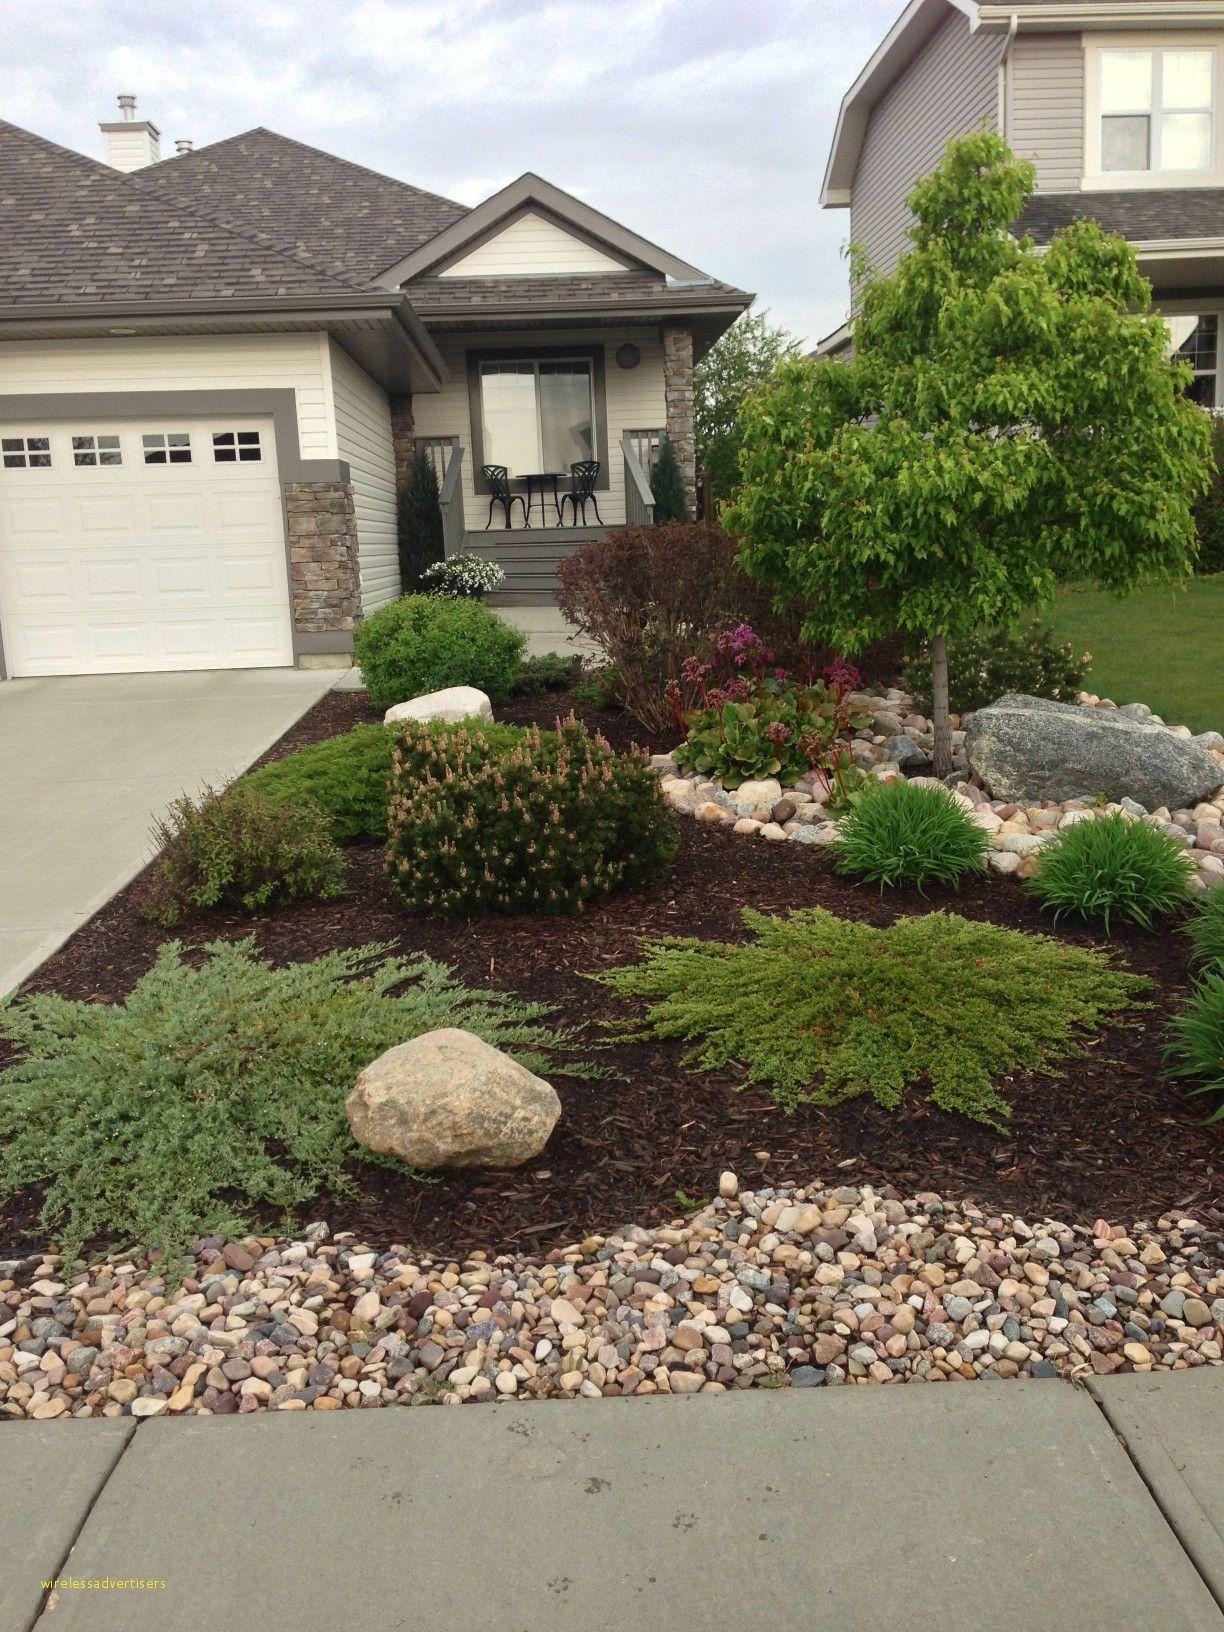 49+ Fancy Front Garden Designs | Farmhouse landscaping ... on Cheap No Grass Backyard Ideas  id=55566